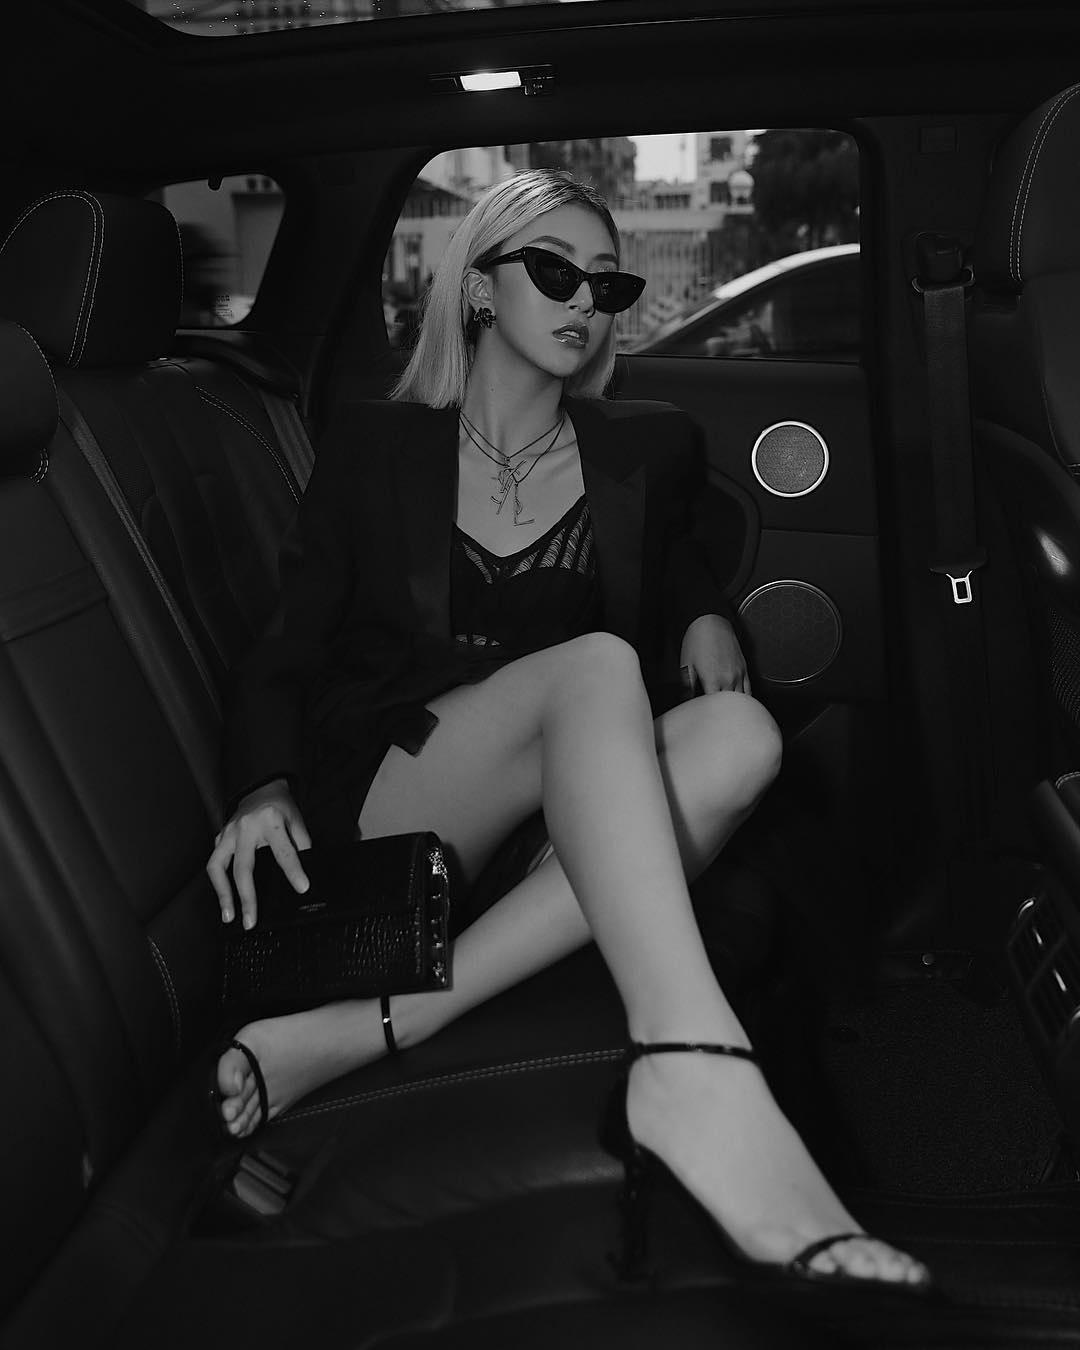 Quynh Anh Shyn - tu hot girl Ha thanh den fashionista co style doc la hinh anh 21 QAS24.jpg